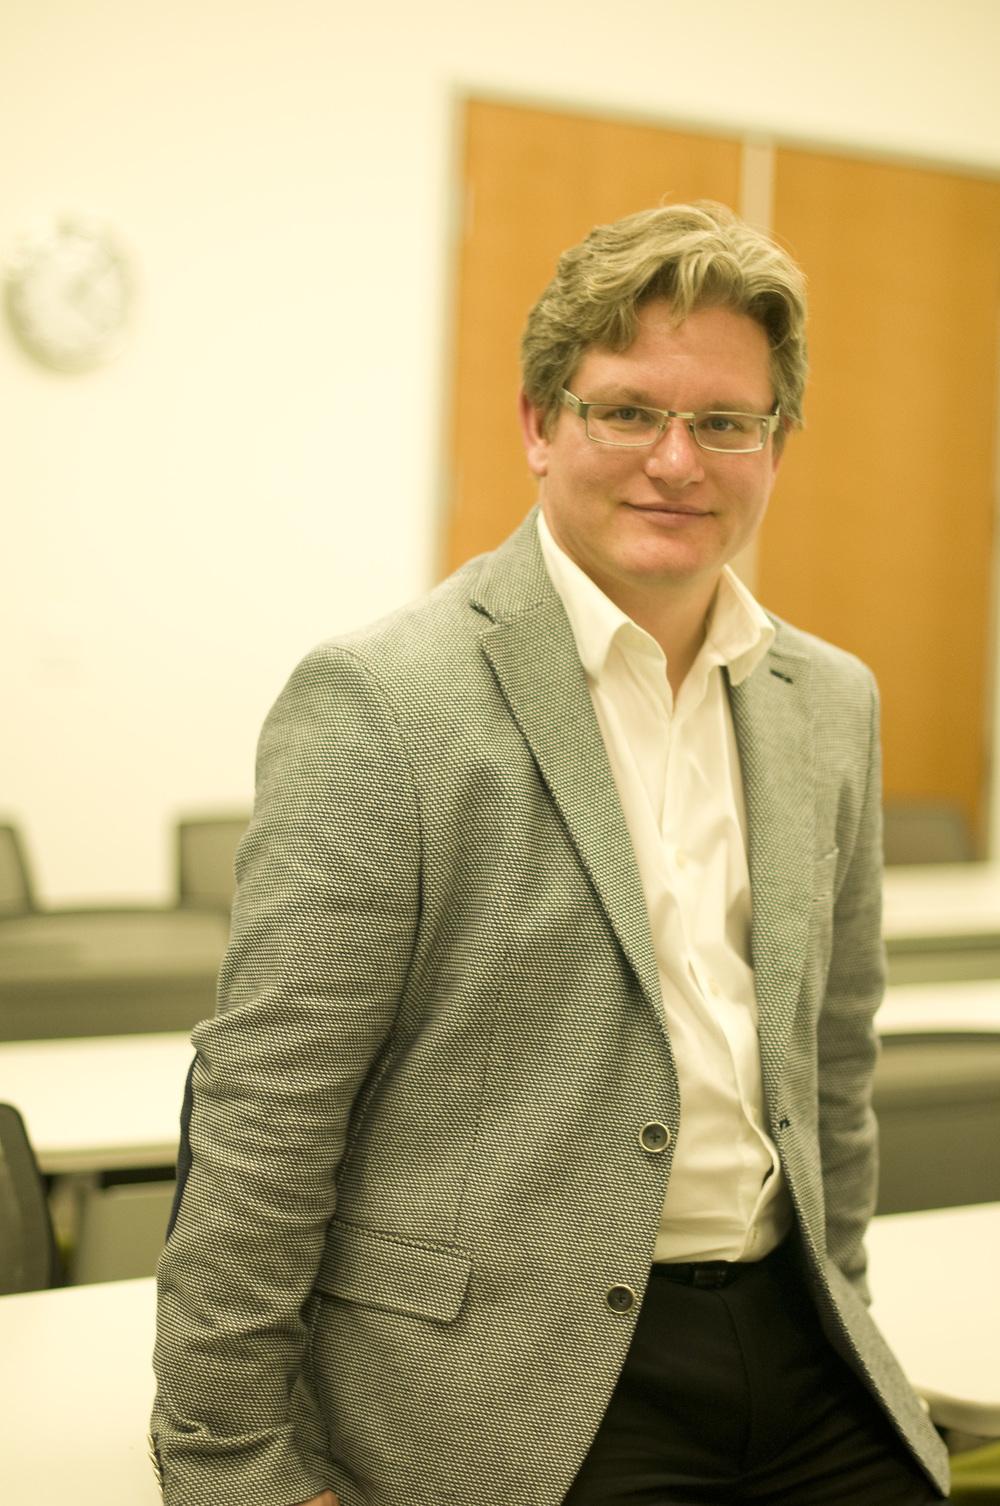 Julian, Entrepreneur